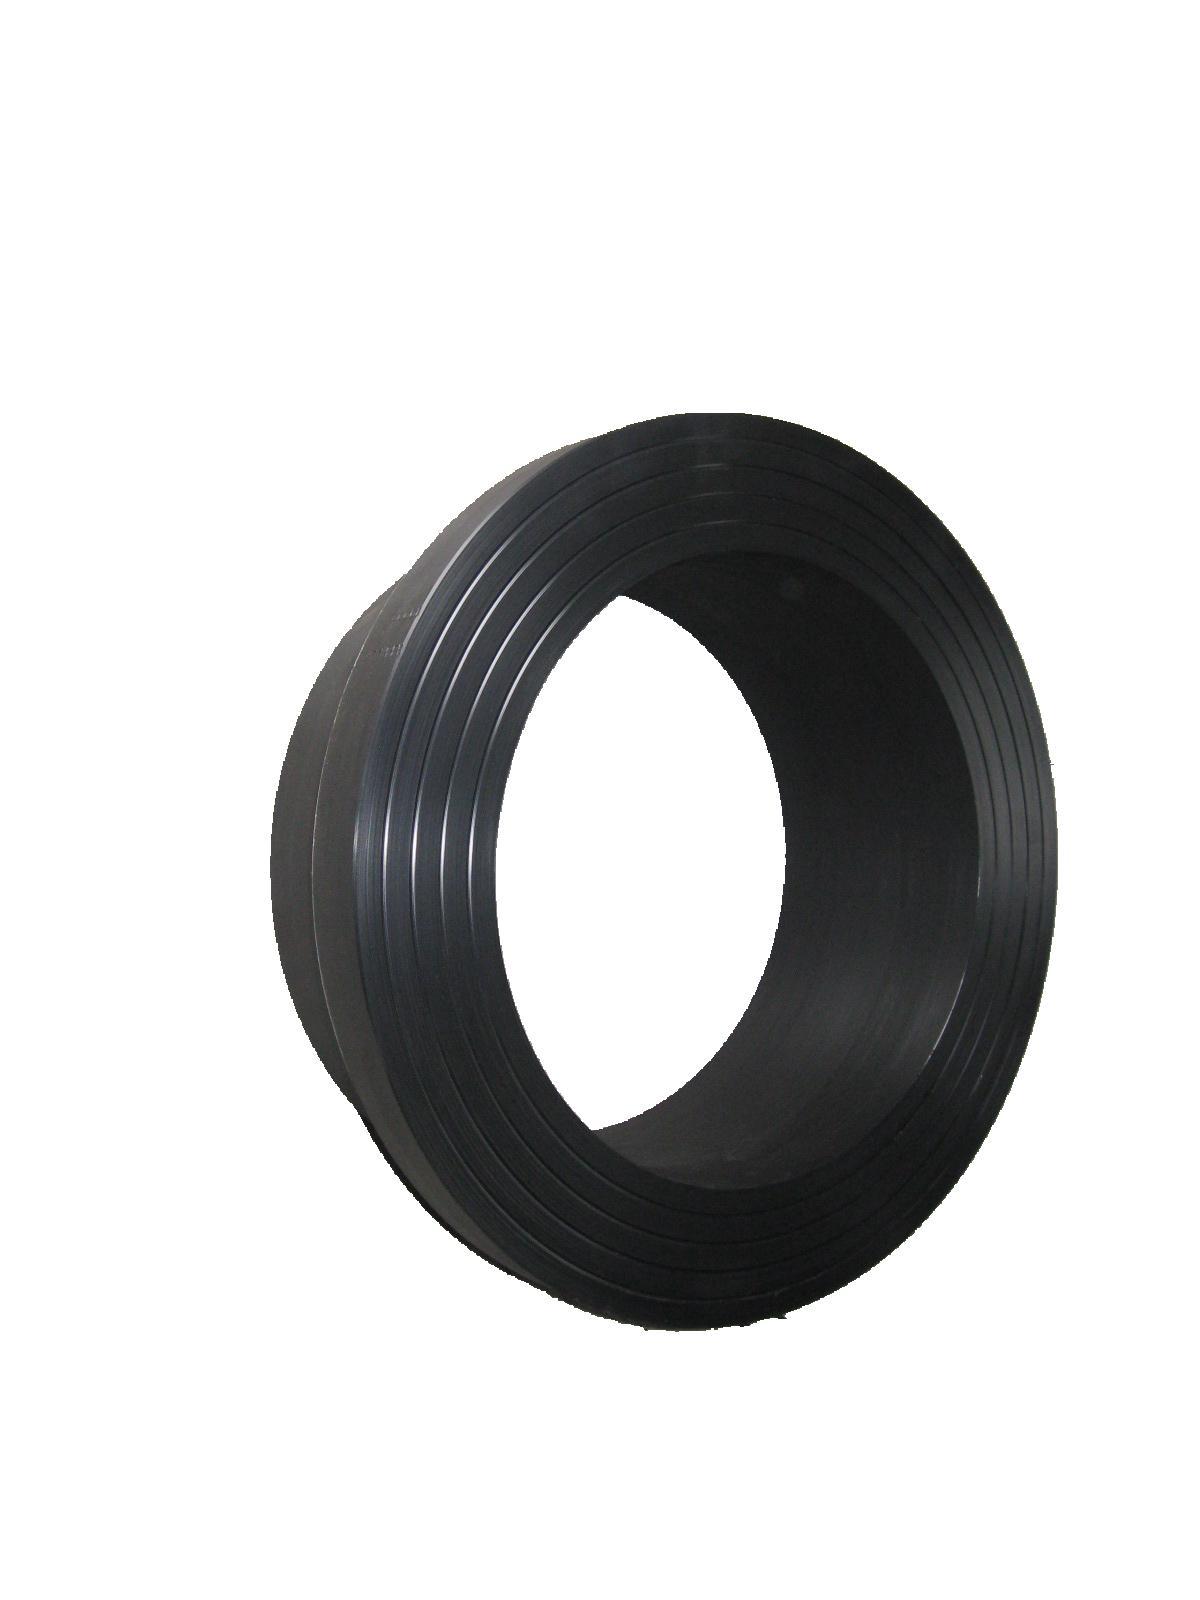 Customizable large diameter HDPE flange 4